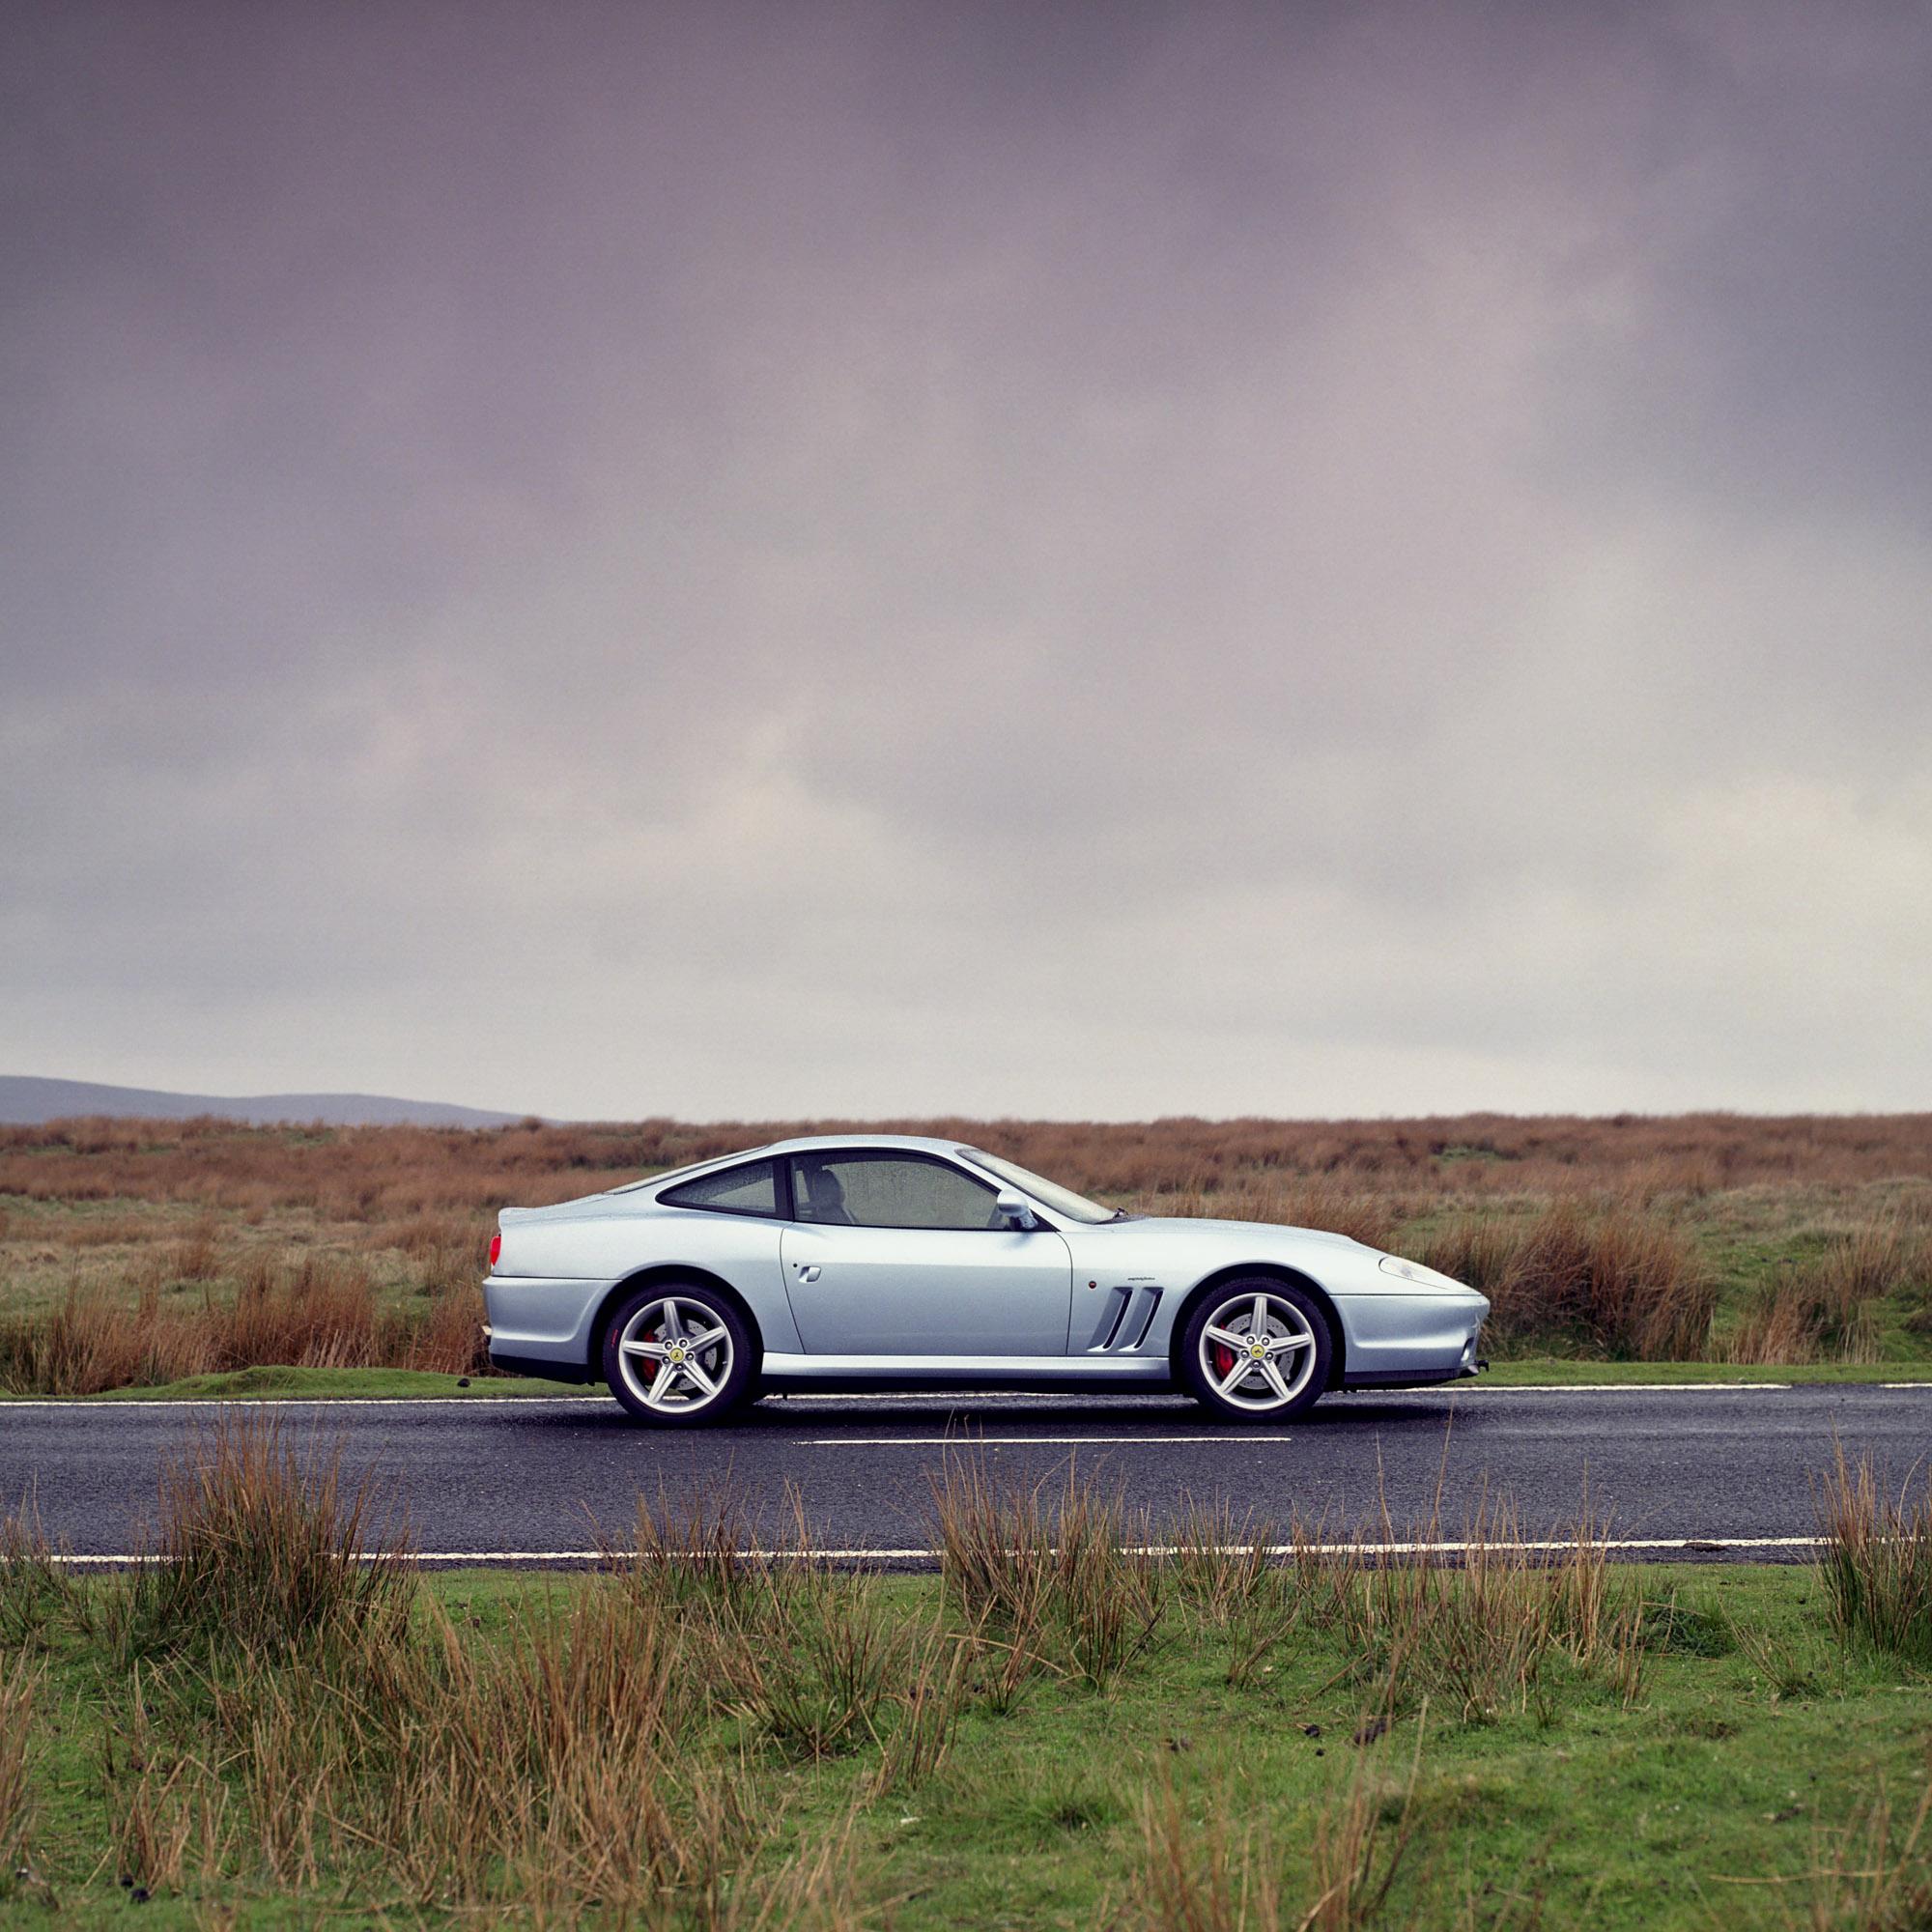 2005 Aston Martin Db9 Interior: LARTE Design To Show Mercedes-Benz V-Class Black Crystal